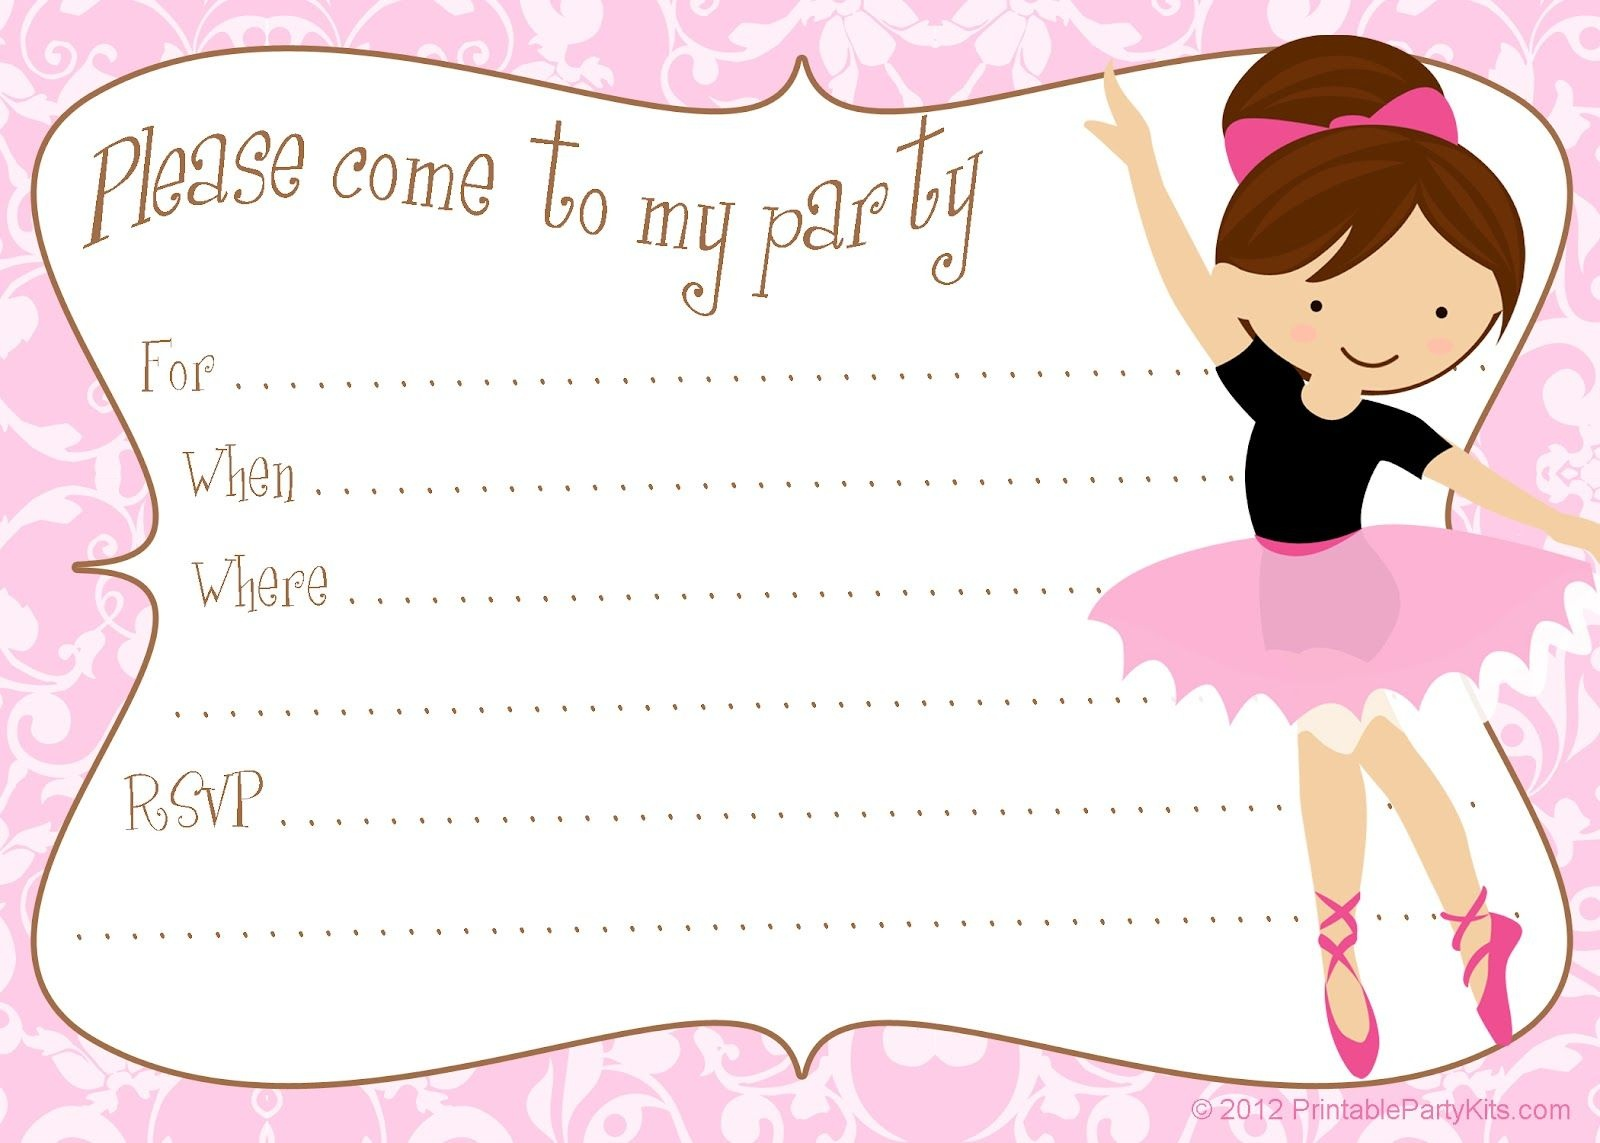 Printable Free Diy Ballerina Party Invitations | Party Printables In - Free Printable Ballerina Birthday Invitations